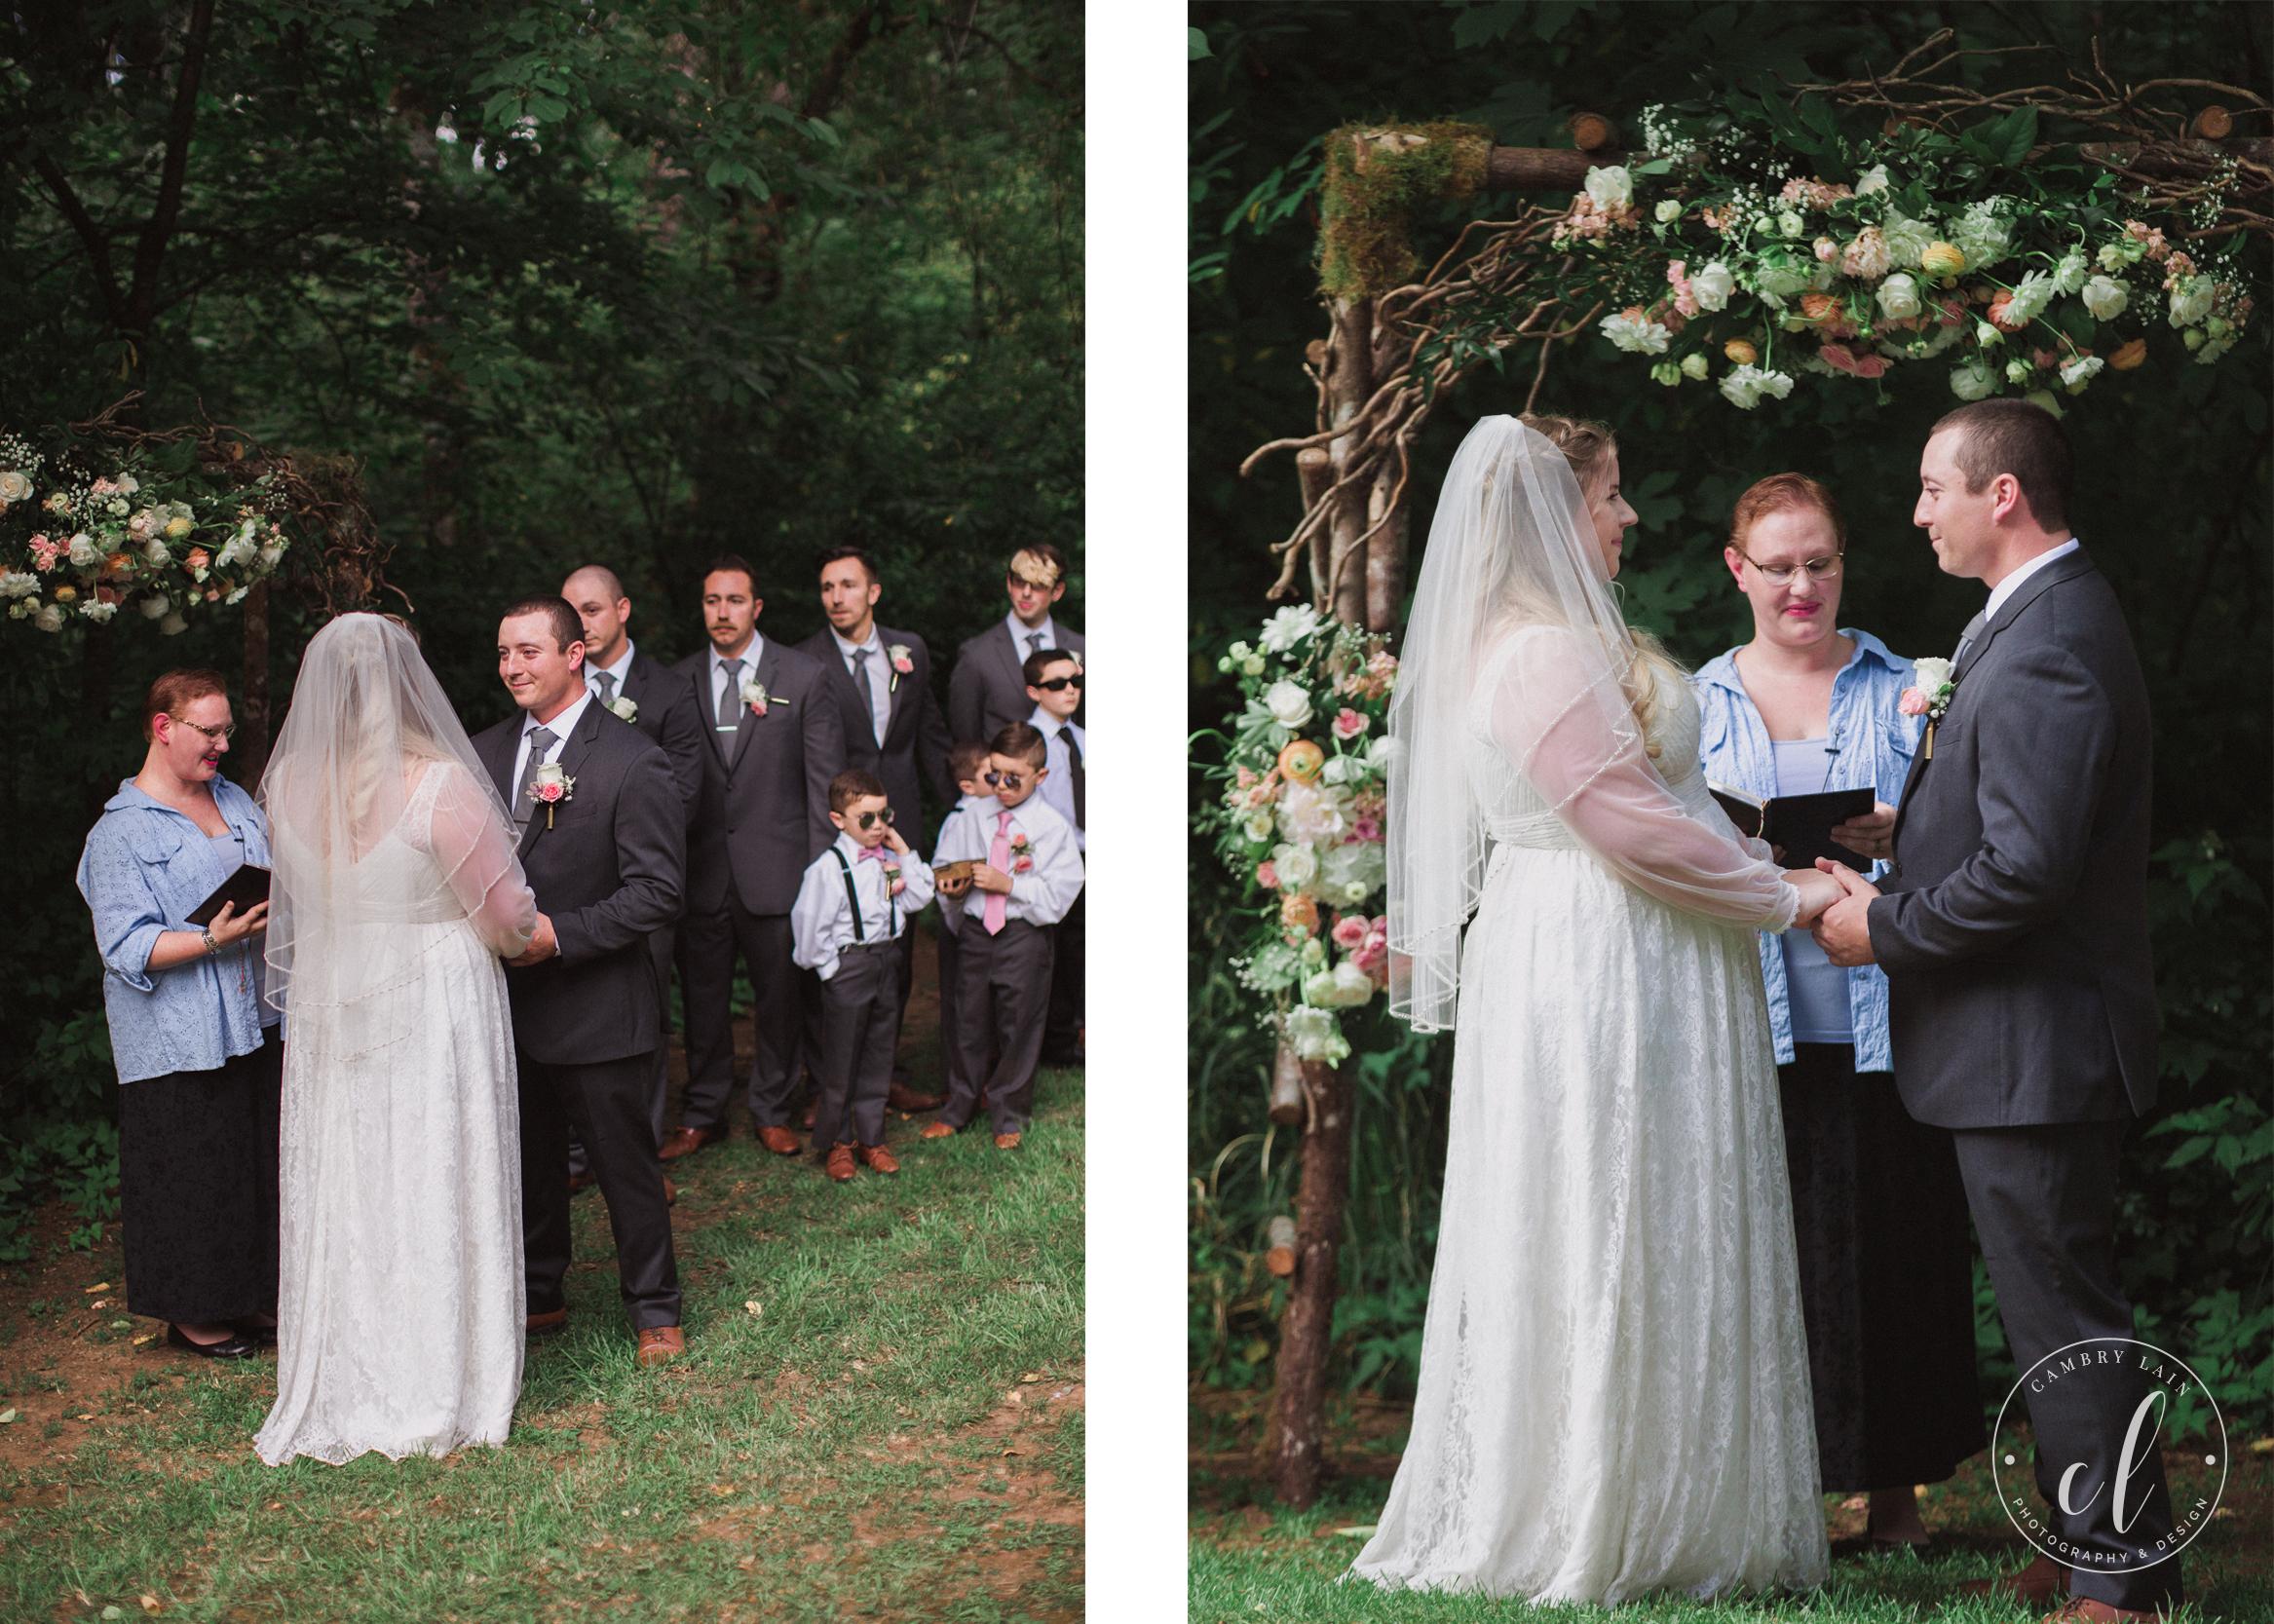 Magness-Tree-Farm-Wedding-Oregon-Wedding-Photographer-Cambry-Lain-Photography